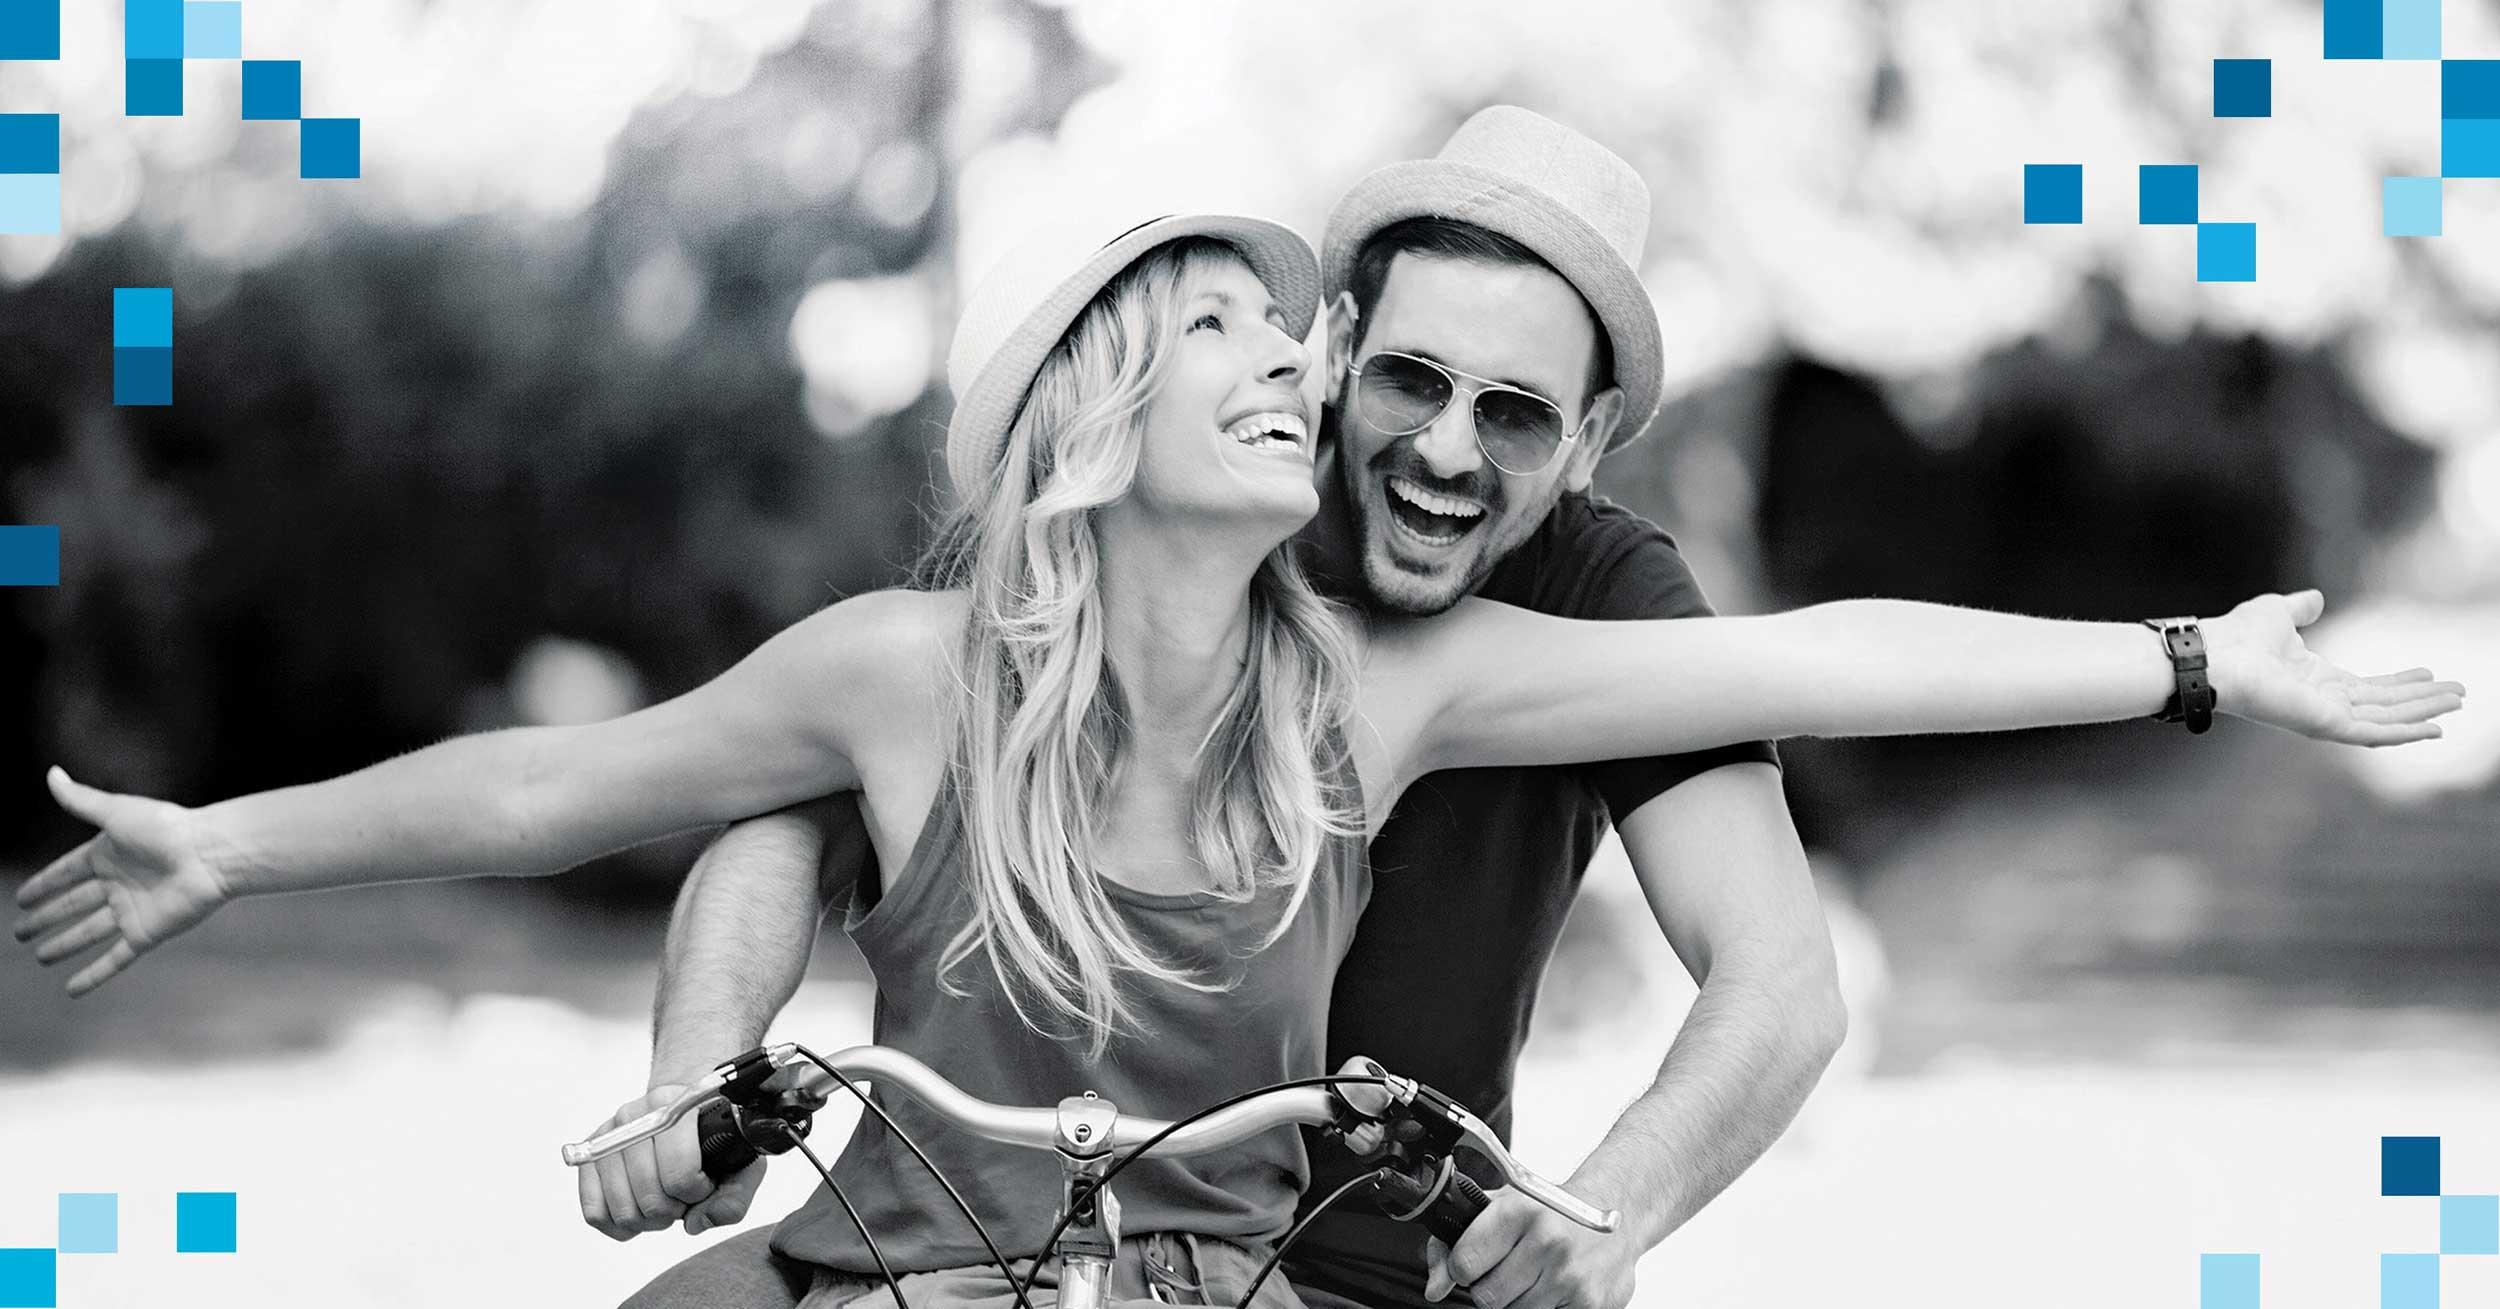 life-style-bike